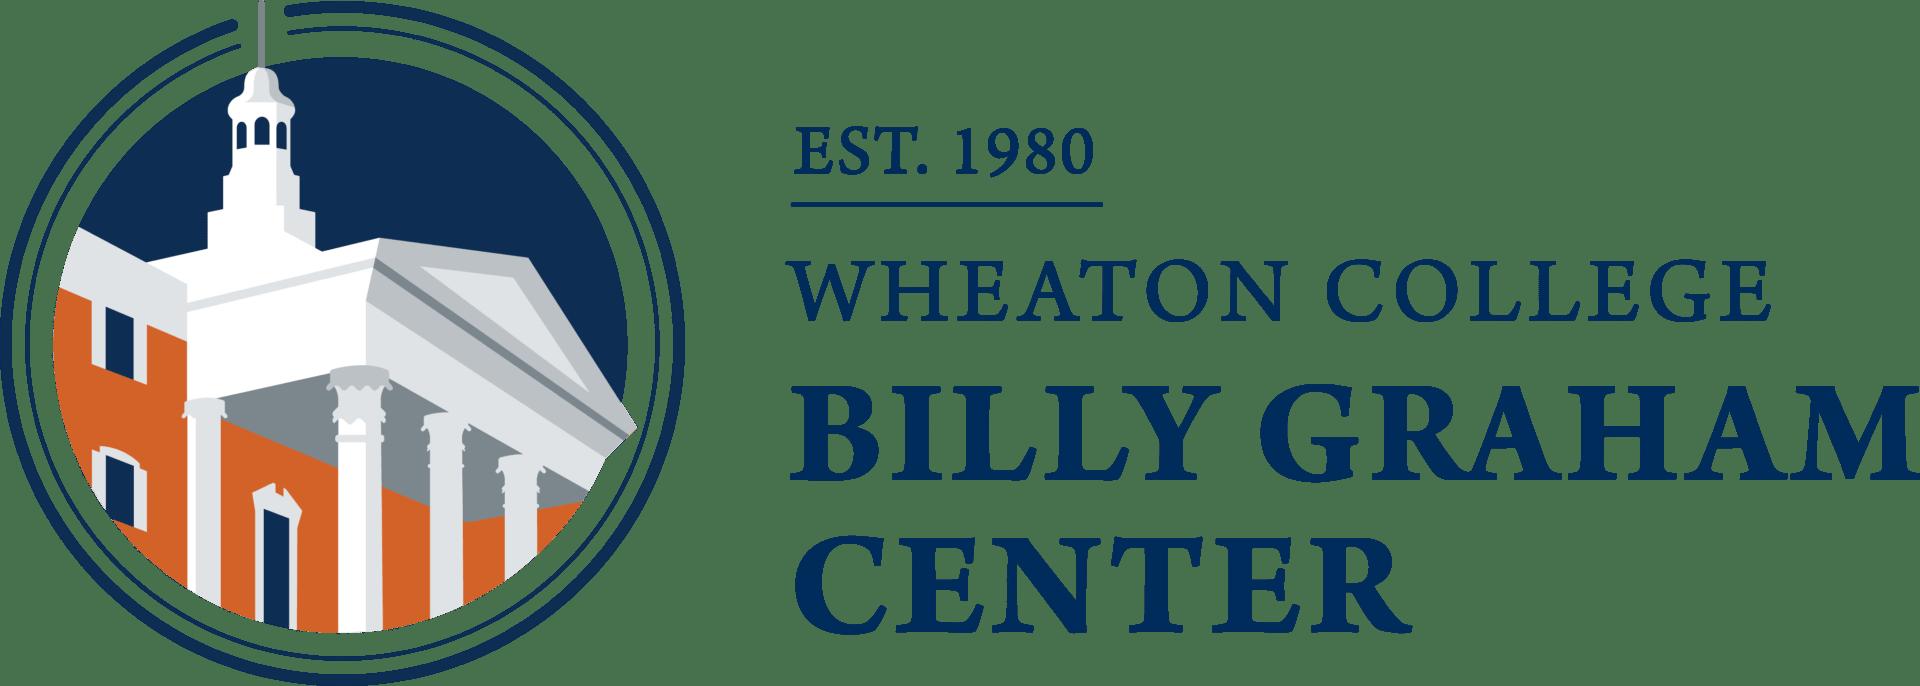 Wheaton College Billy Graham Center